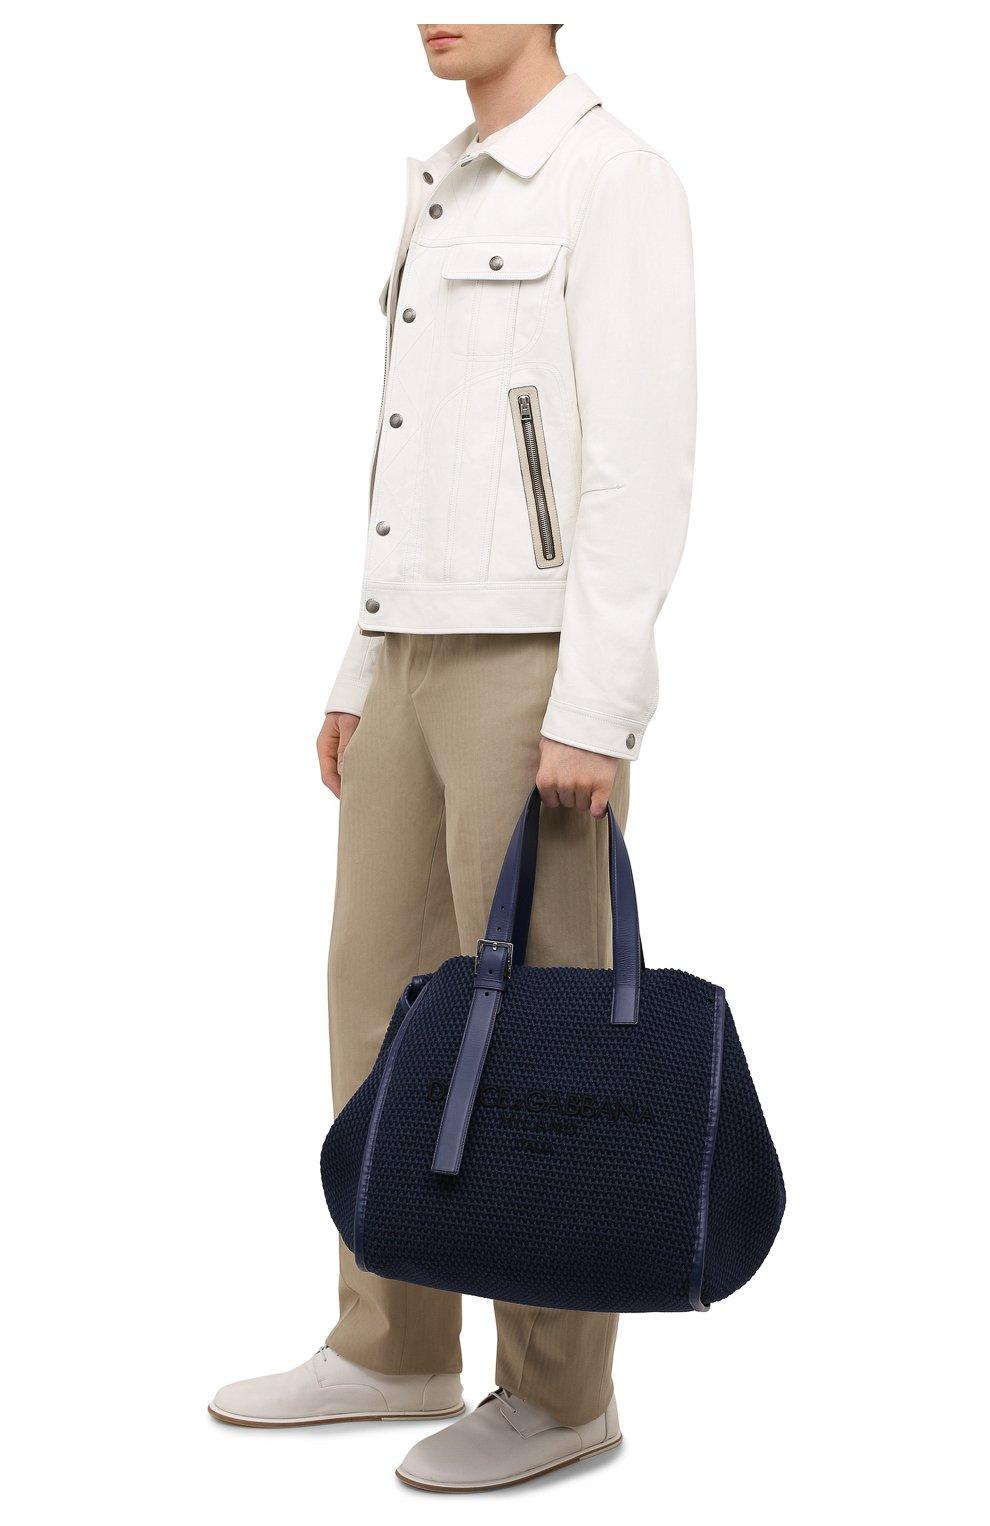 Мужская текстильная сумка-шопер DOLCE & GABBANA темно-синего цвета, арт. BM1834/A0307   Фото 2 (Материал: Текстиль)